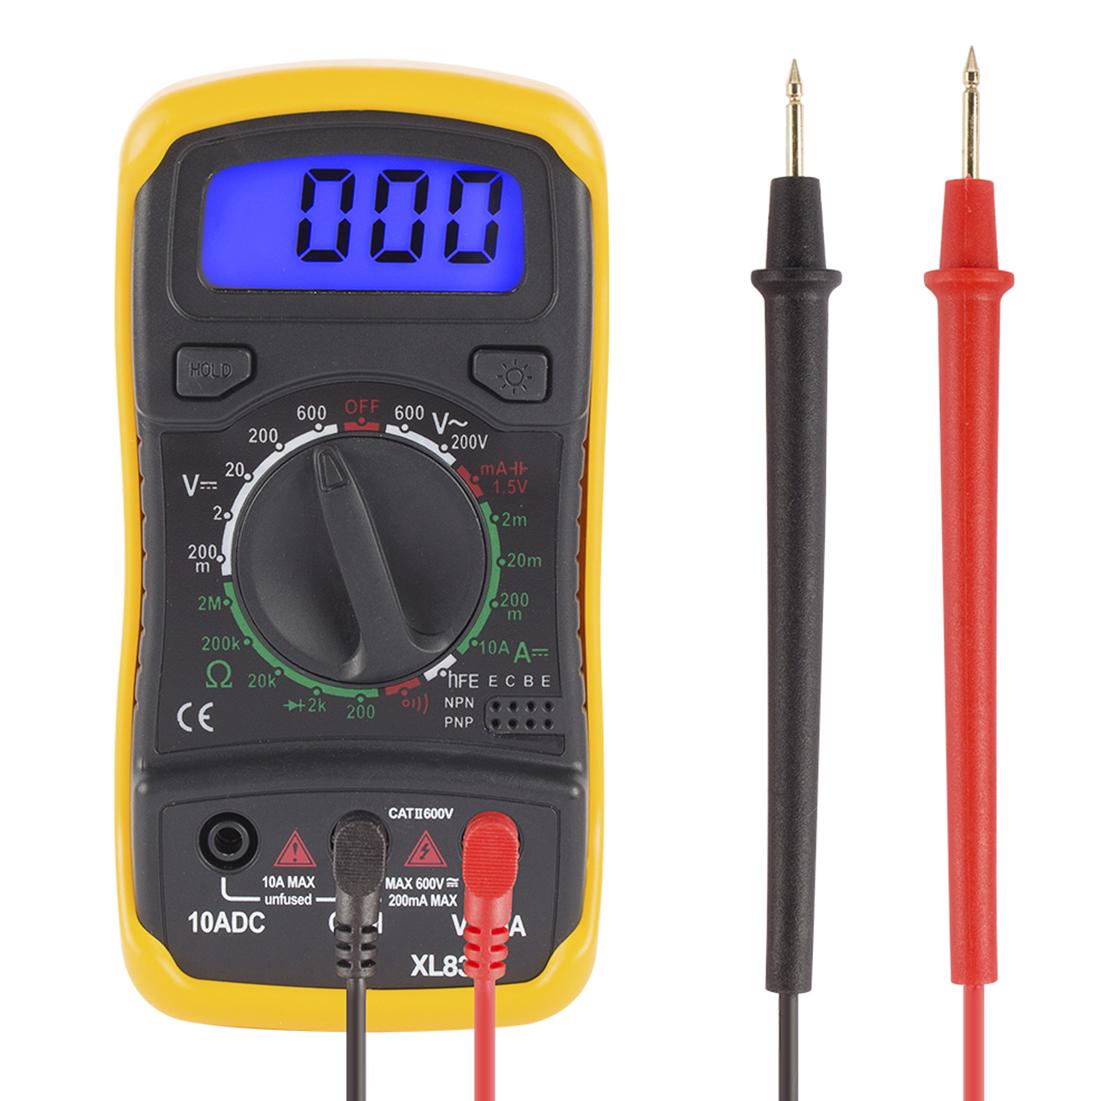 Digital Multimeter AC DC Voltmeter Ammeter Ohmmeter Diode Meter LCD Display